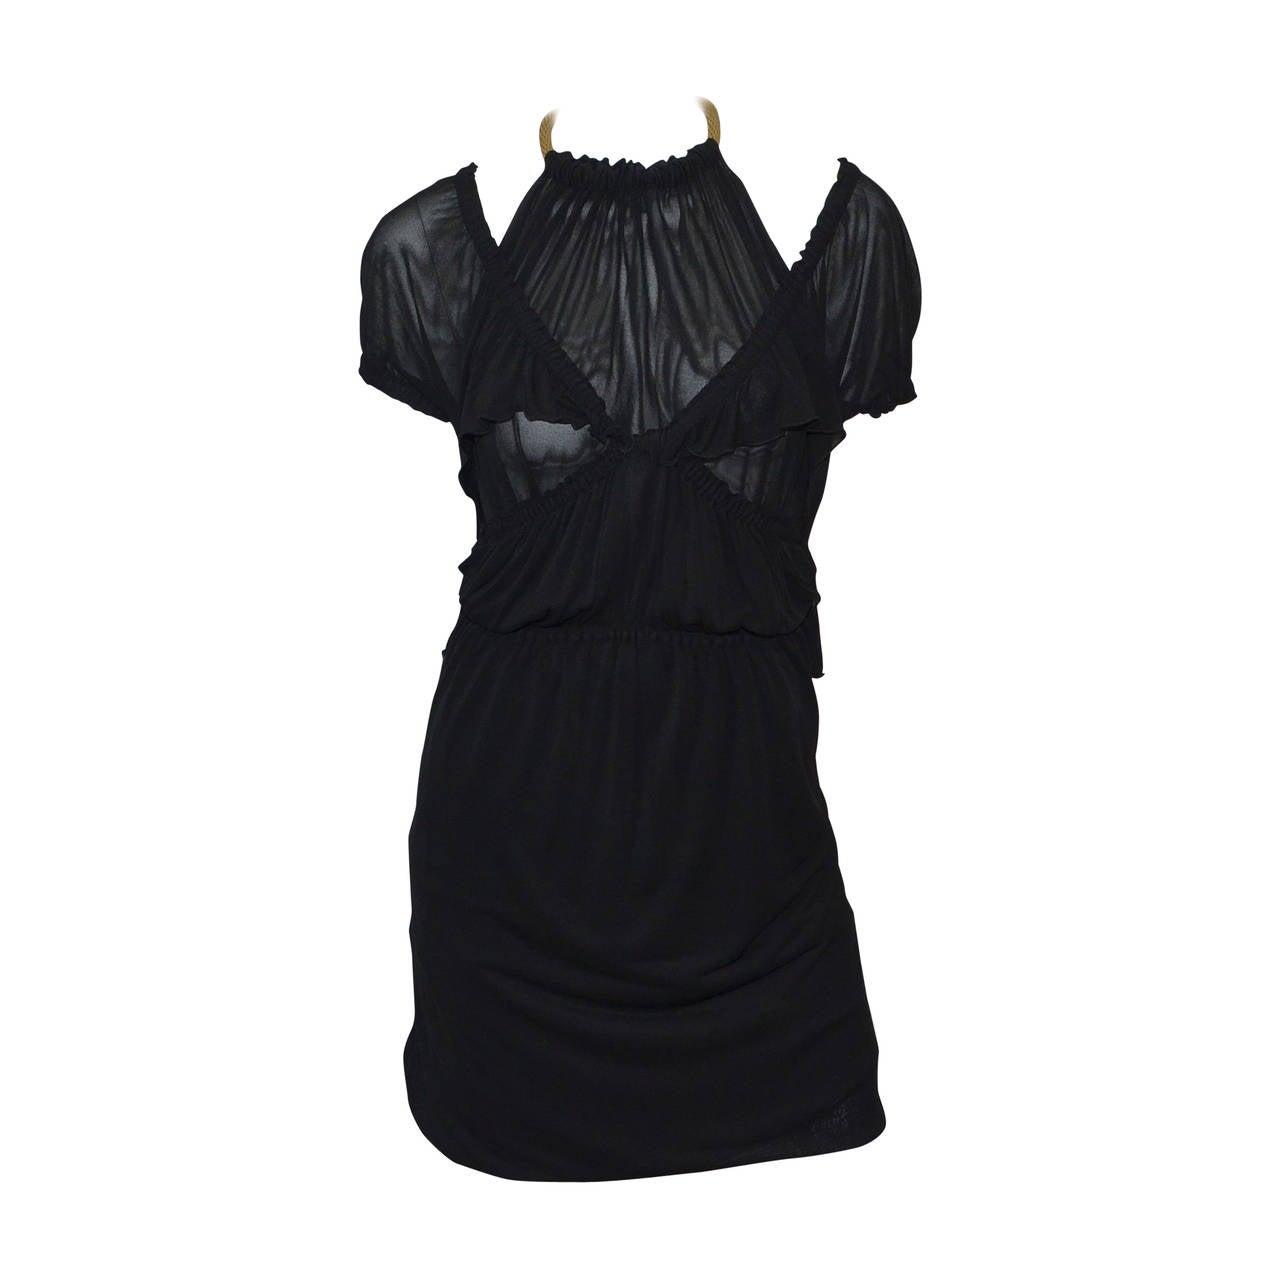 Yves Saint Laurent 1990s Jersey Halter Dress M